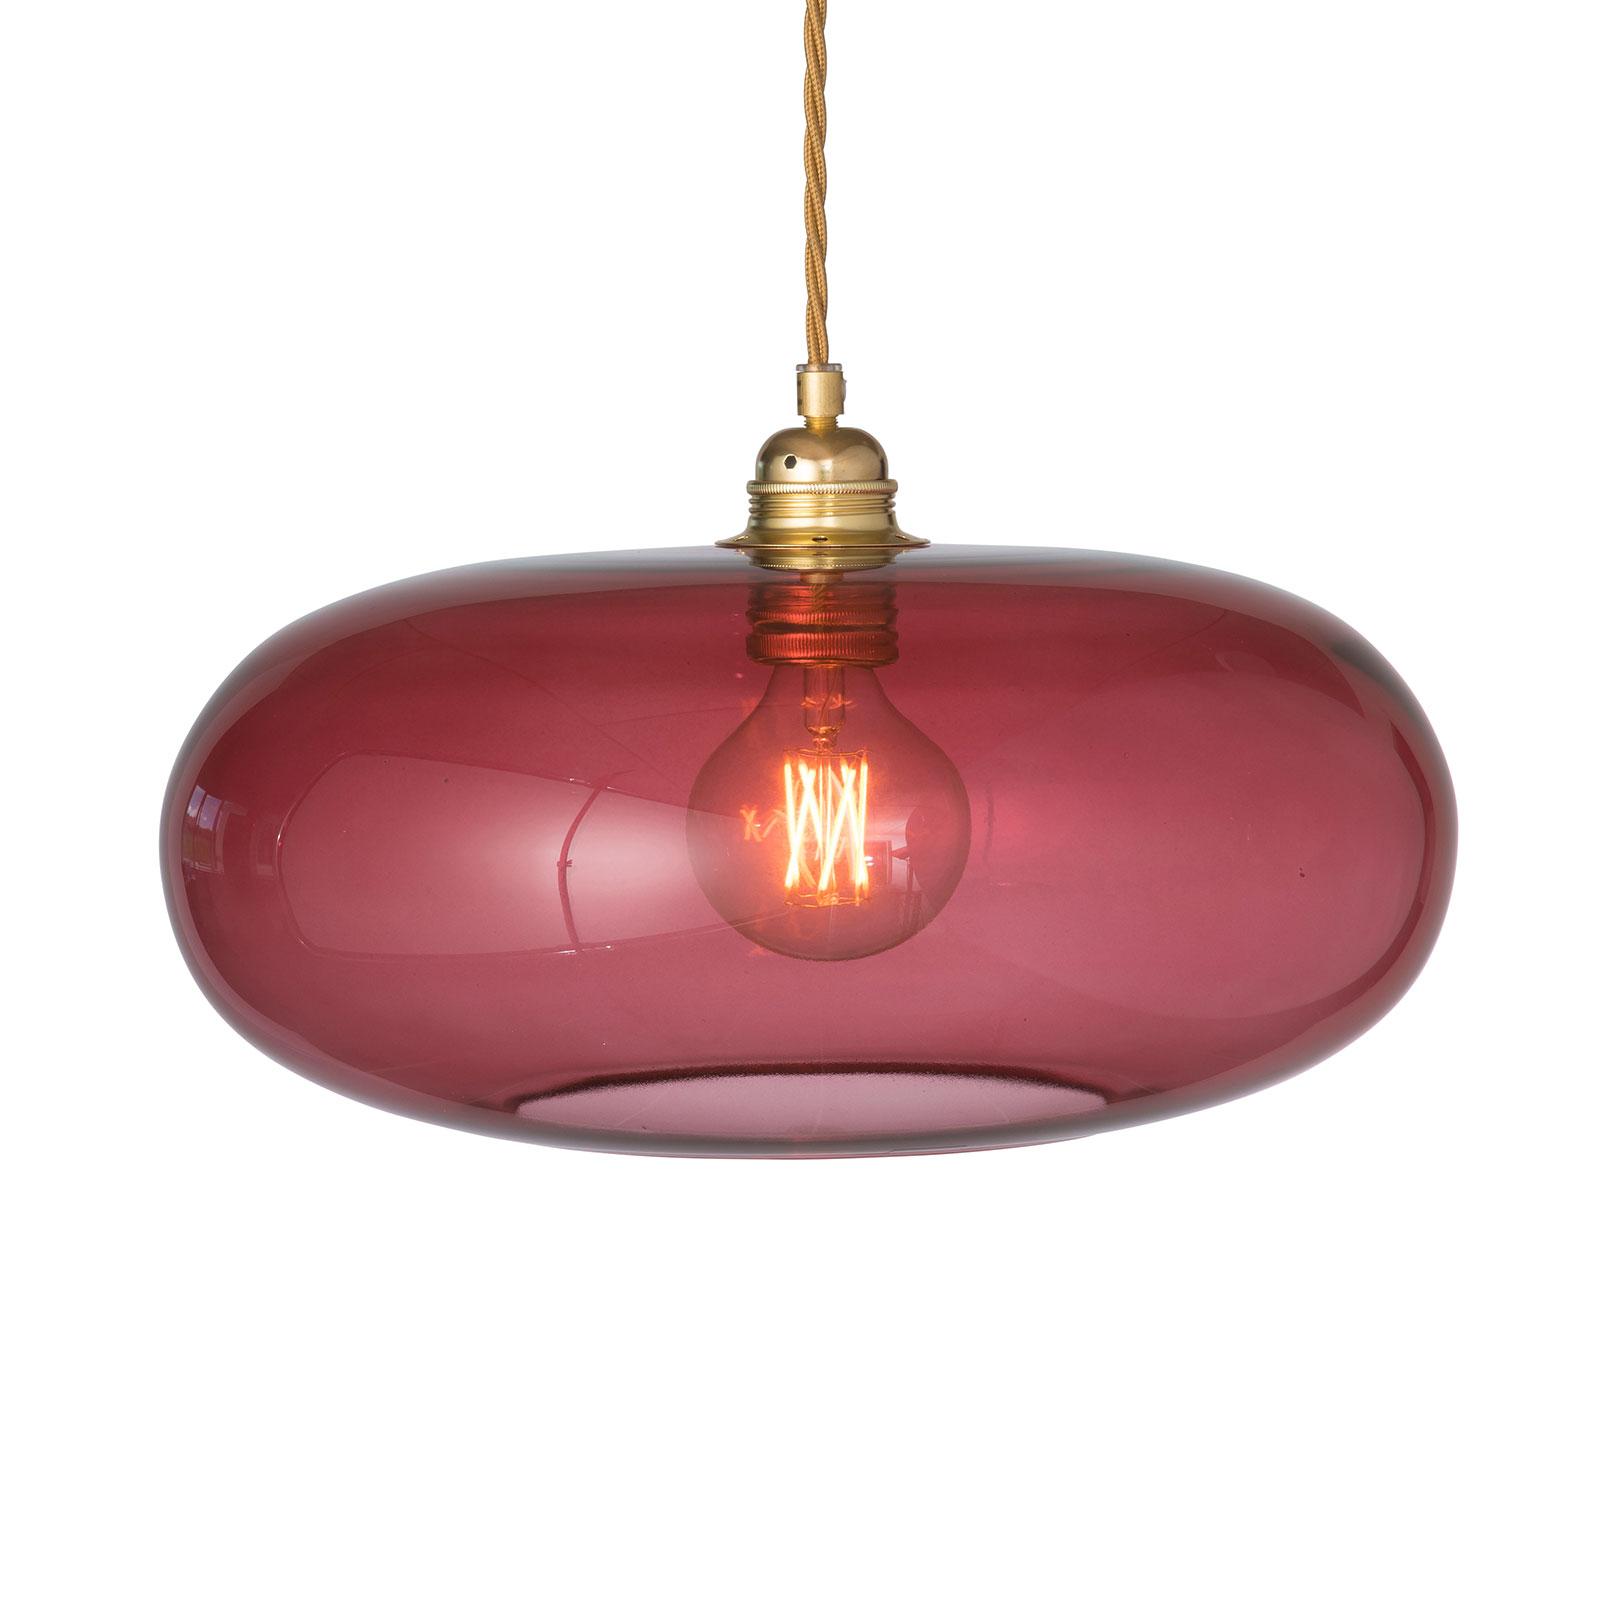 EBB & FLOW Horizon hanglamp rood Ø 36 cm